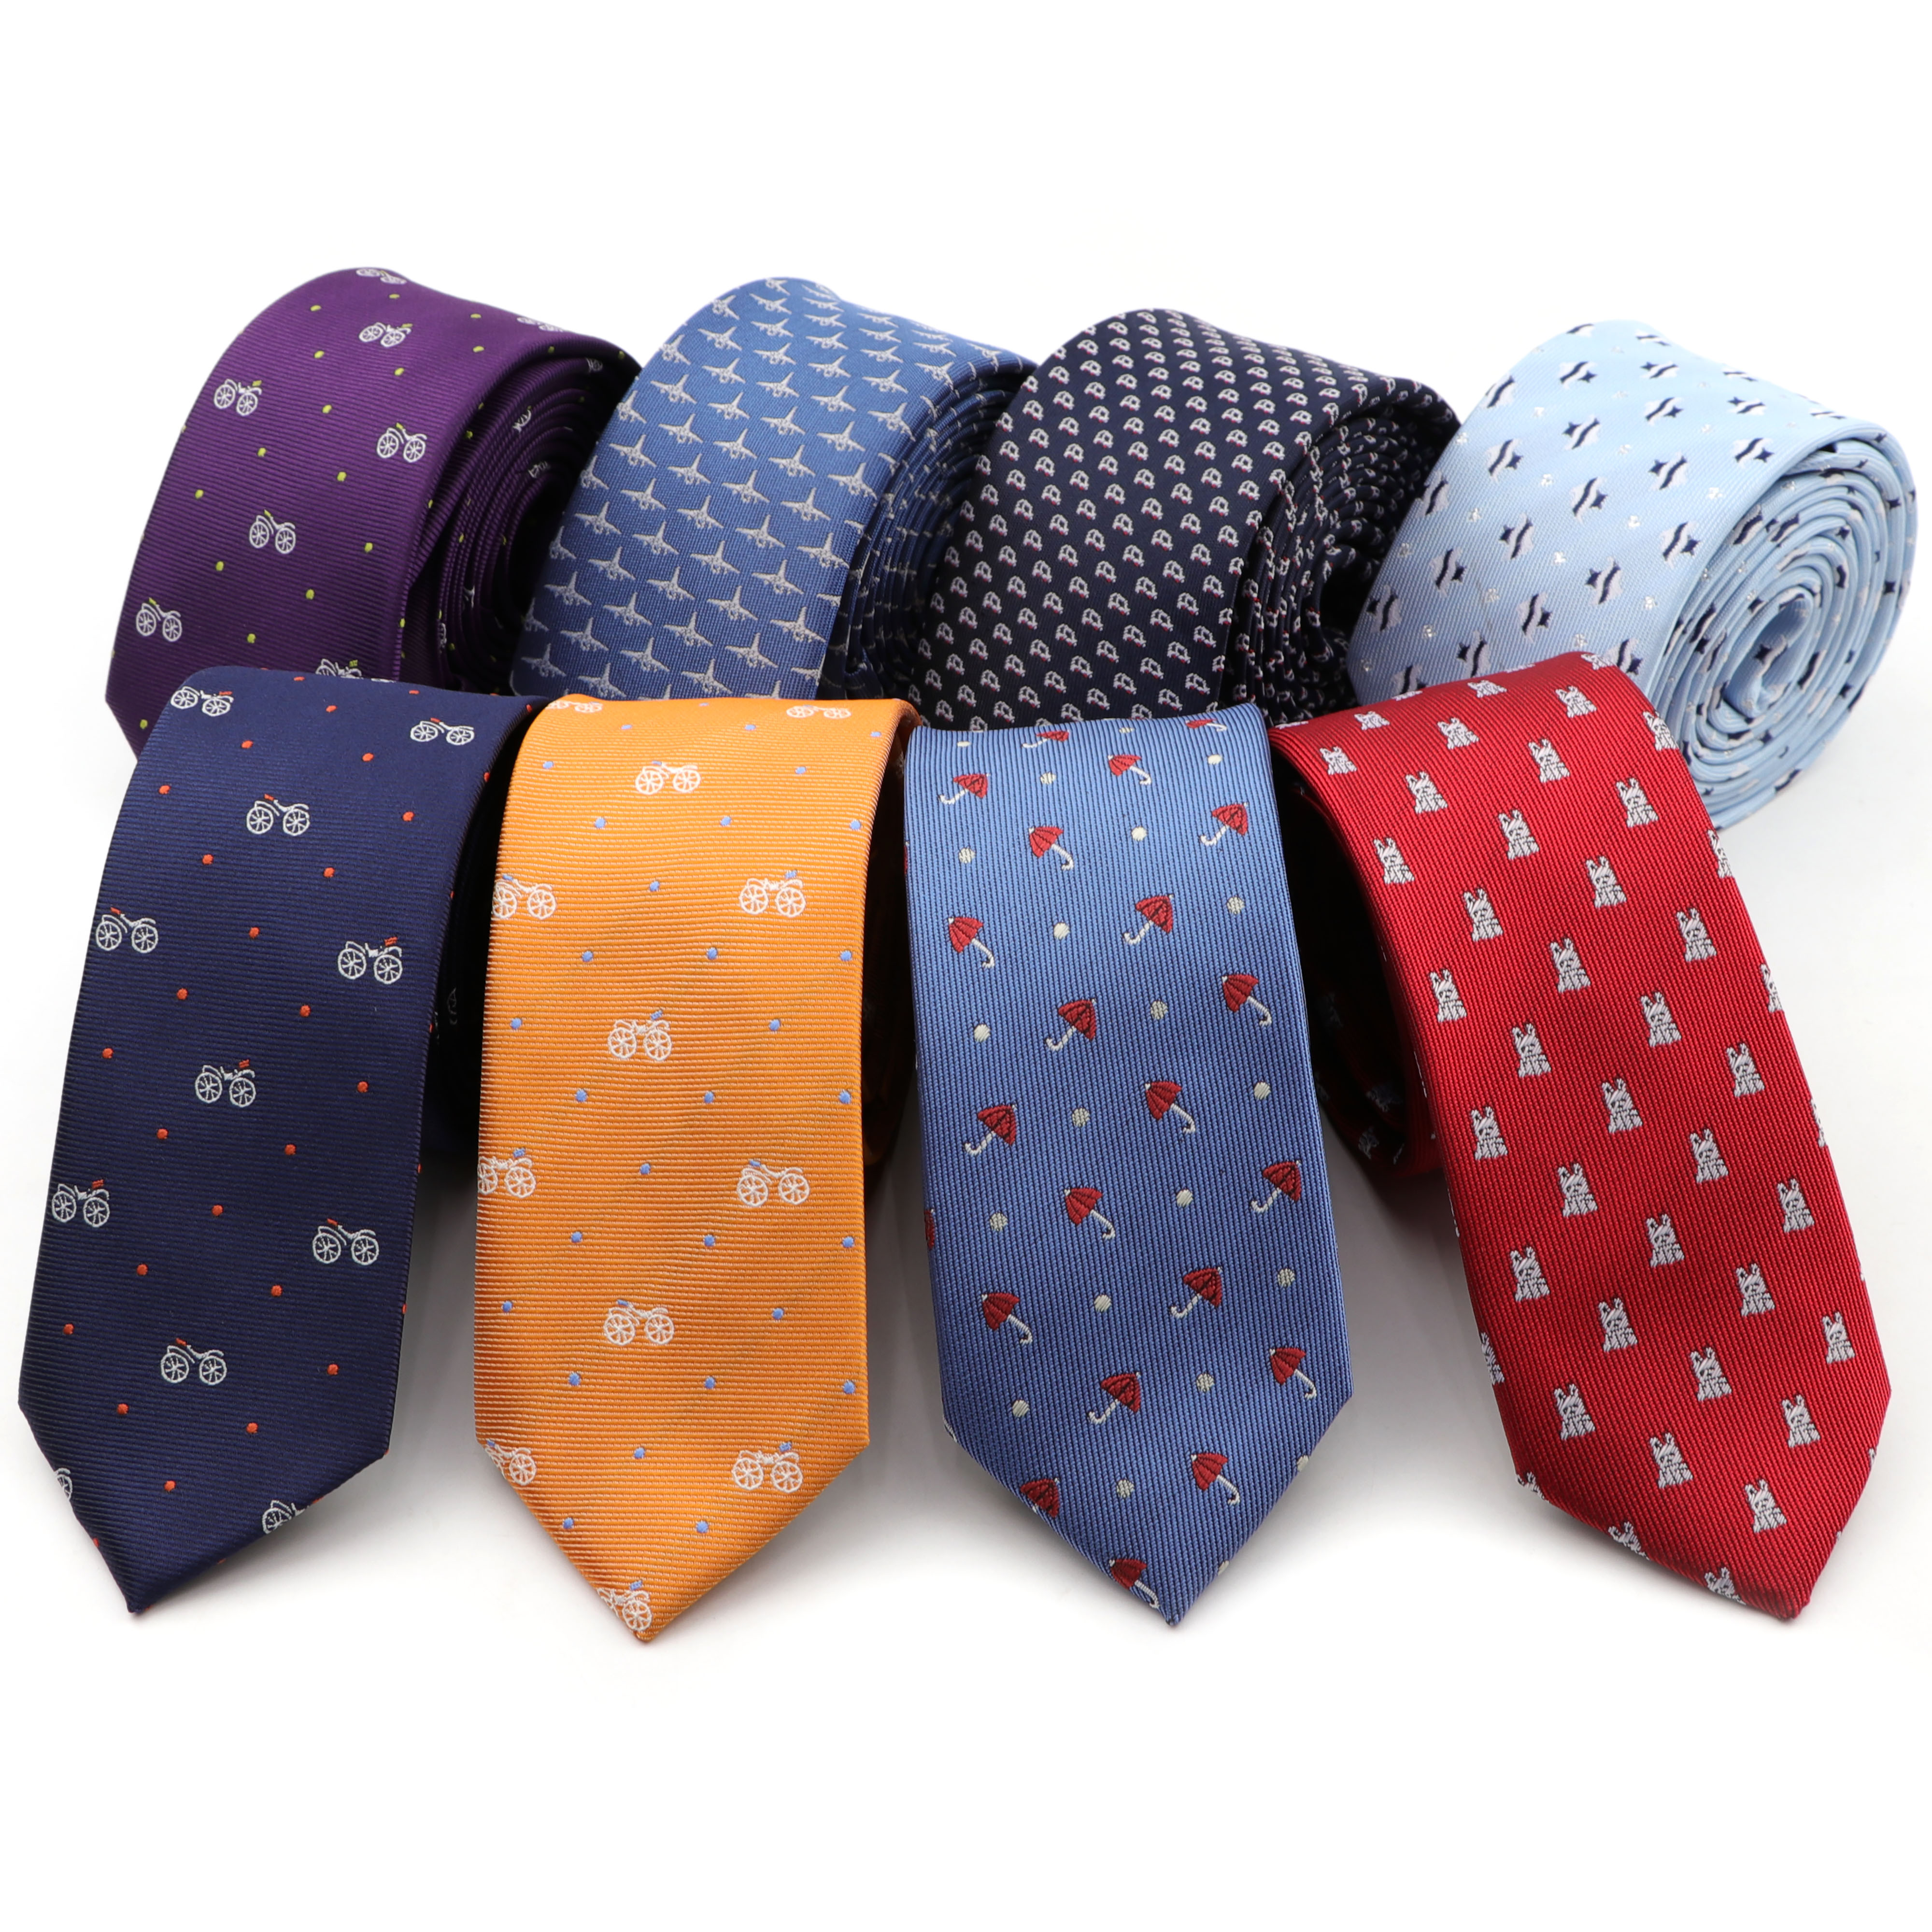 Corbata delgada Formal de 6CM para hombre, paraguas para novio, coche, pez, bicicleta, lazos clásicos estrechos, corbata de poliéster de moda de ocio